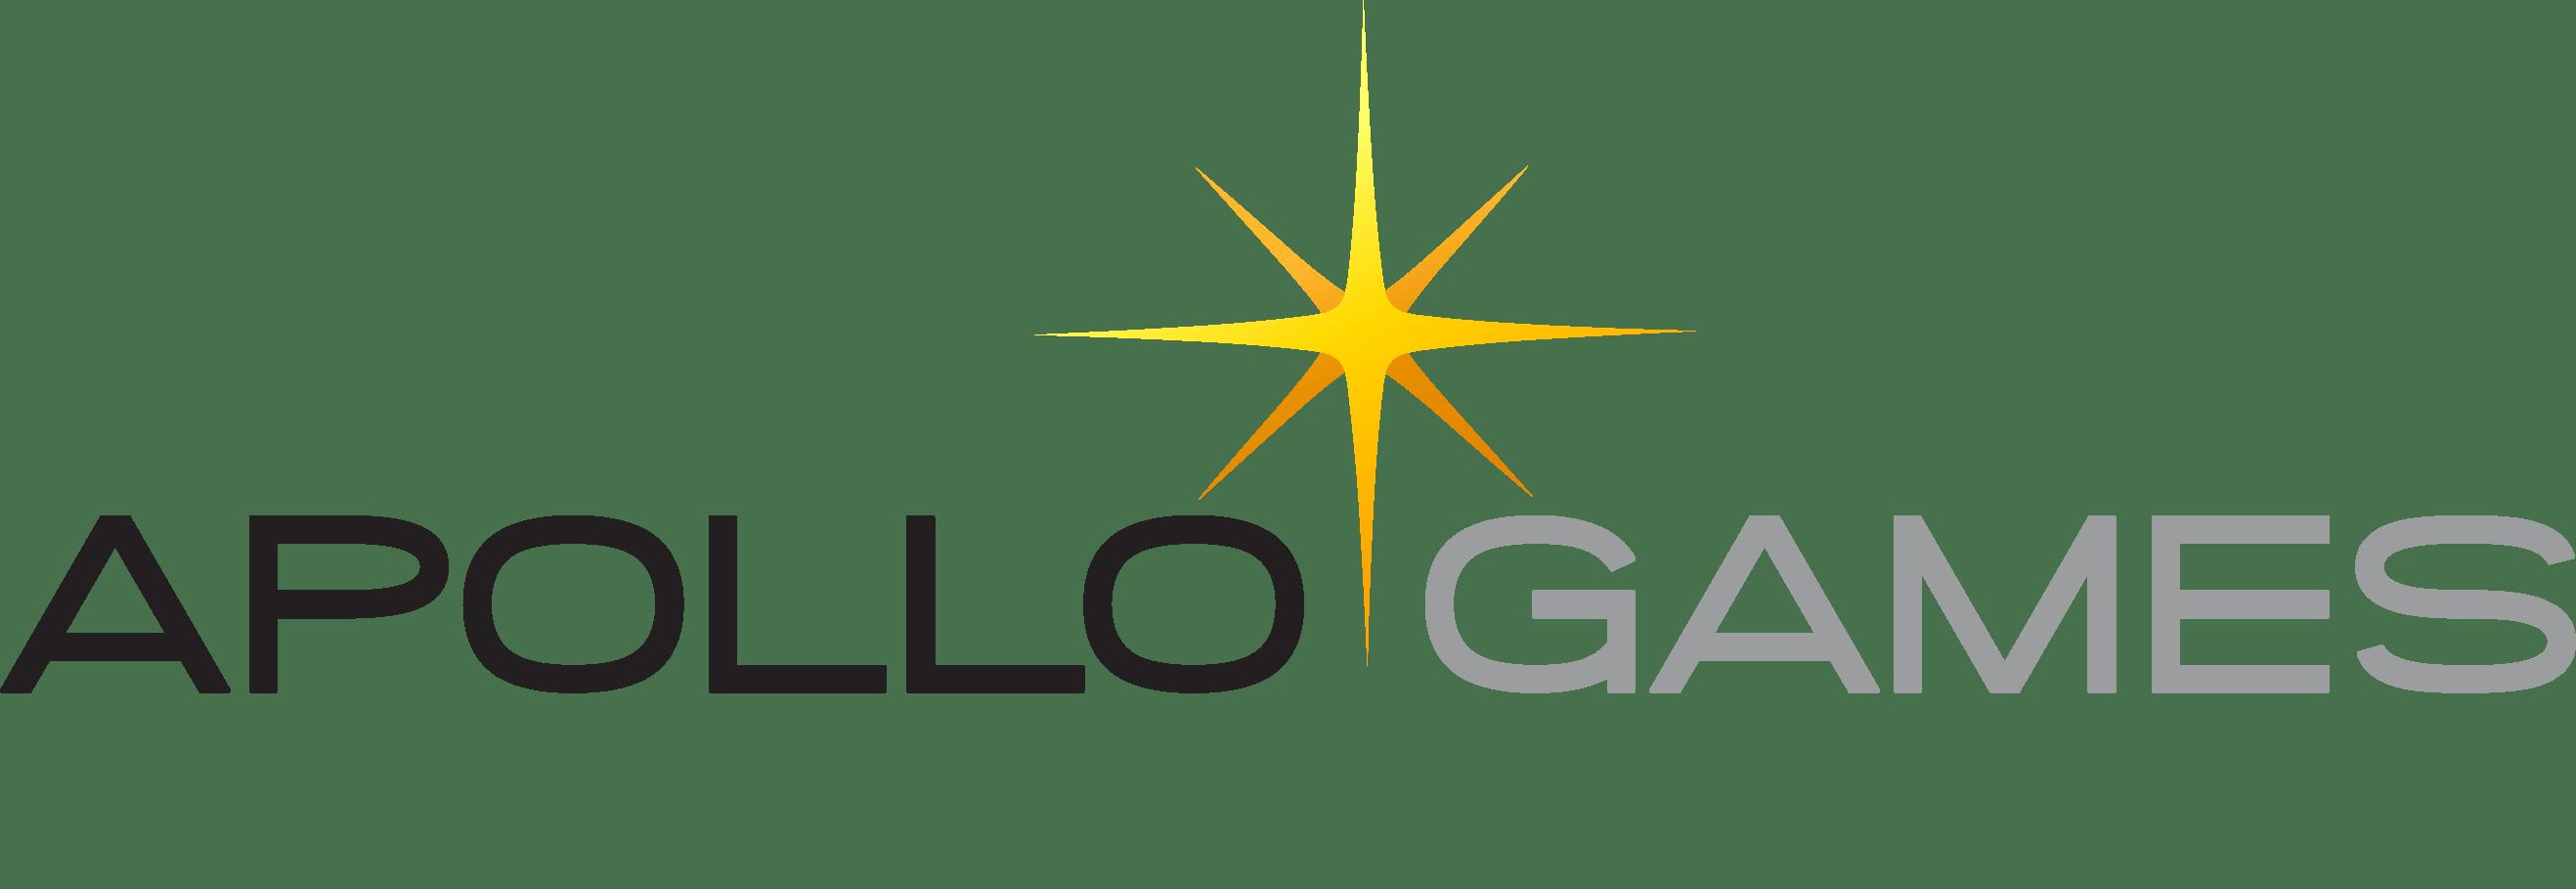 Apollo Games 游戏